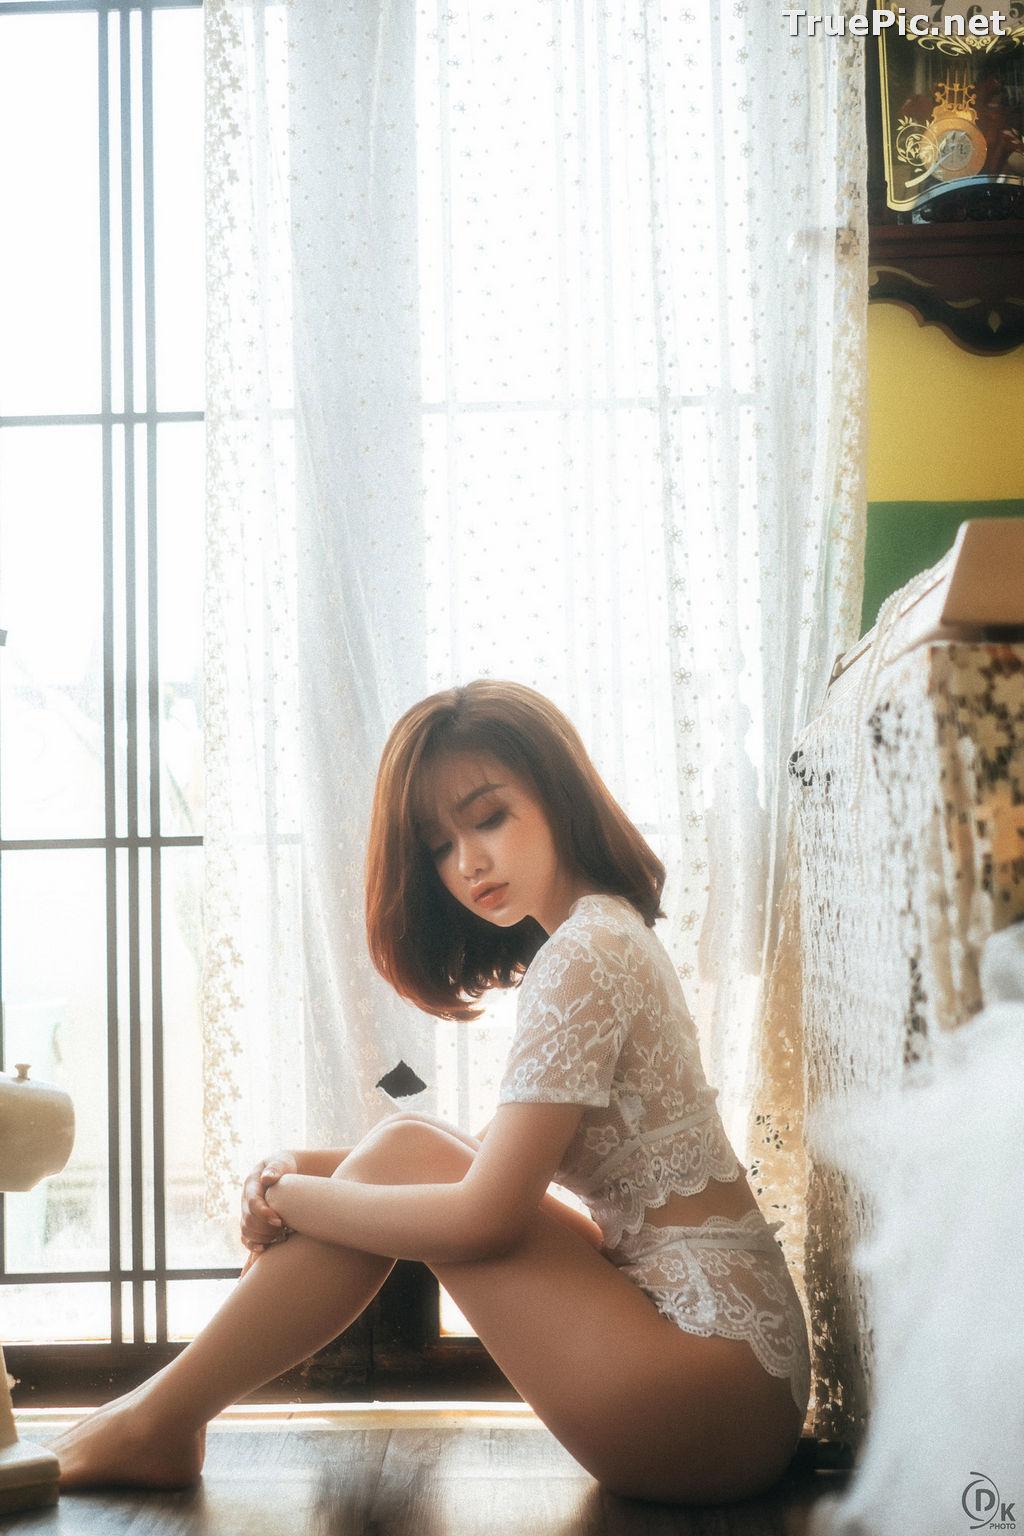 Image Vietnamese Hot Model - Sleepwear and Lingerie Under Dawnlight - TruePic.net - Picture-7